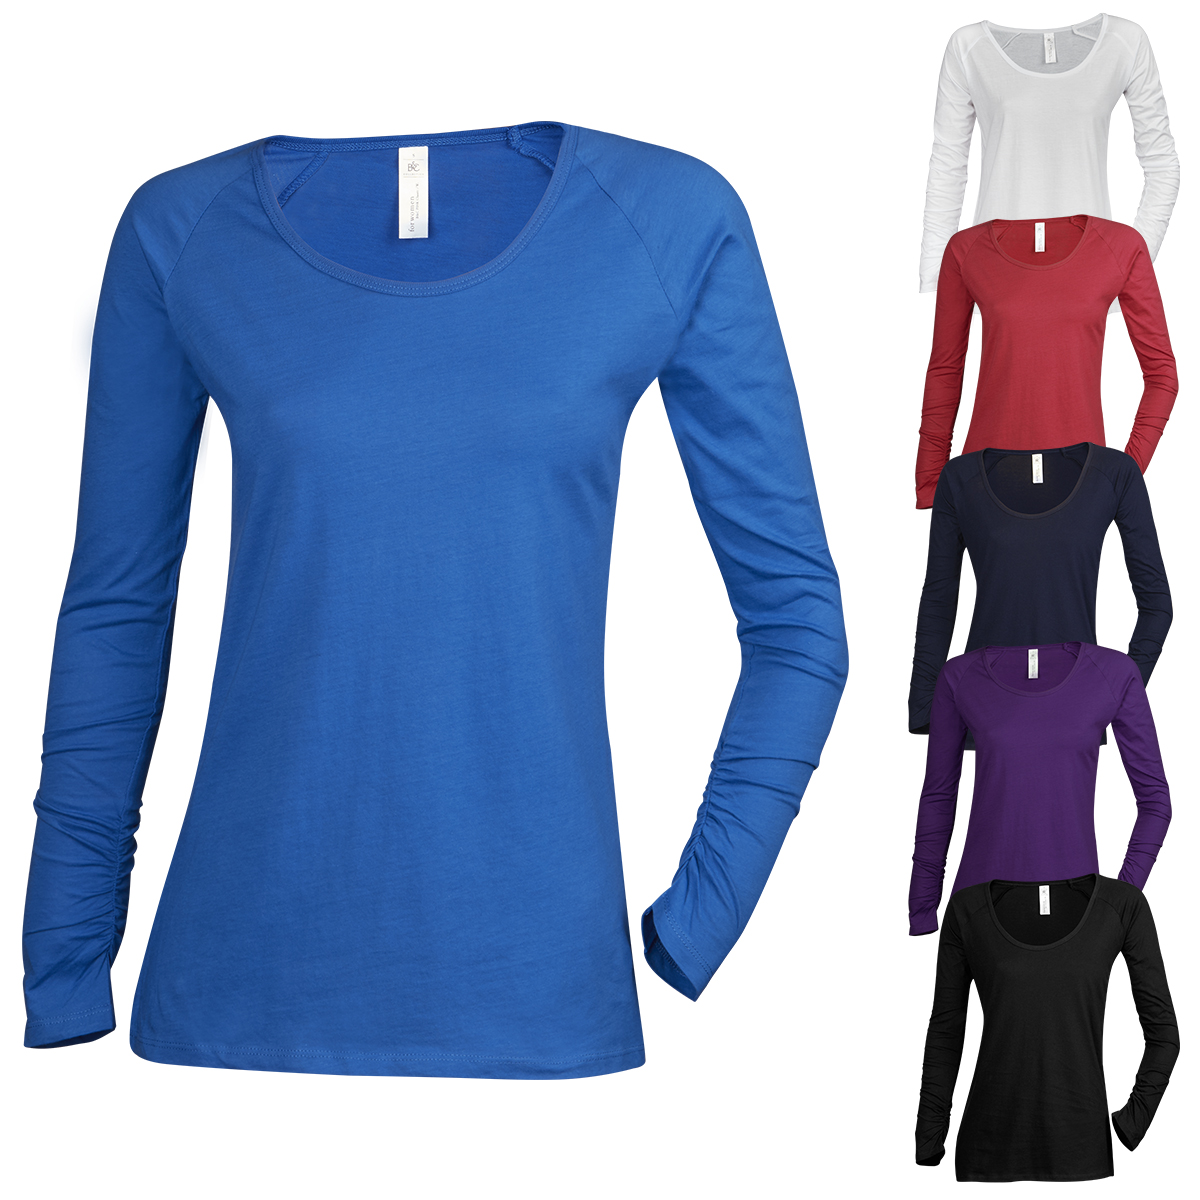 Womens Ladies T-Shirt Top Plain Sleeve Scoop Neck Tee New Size 100/% Cotton